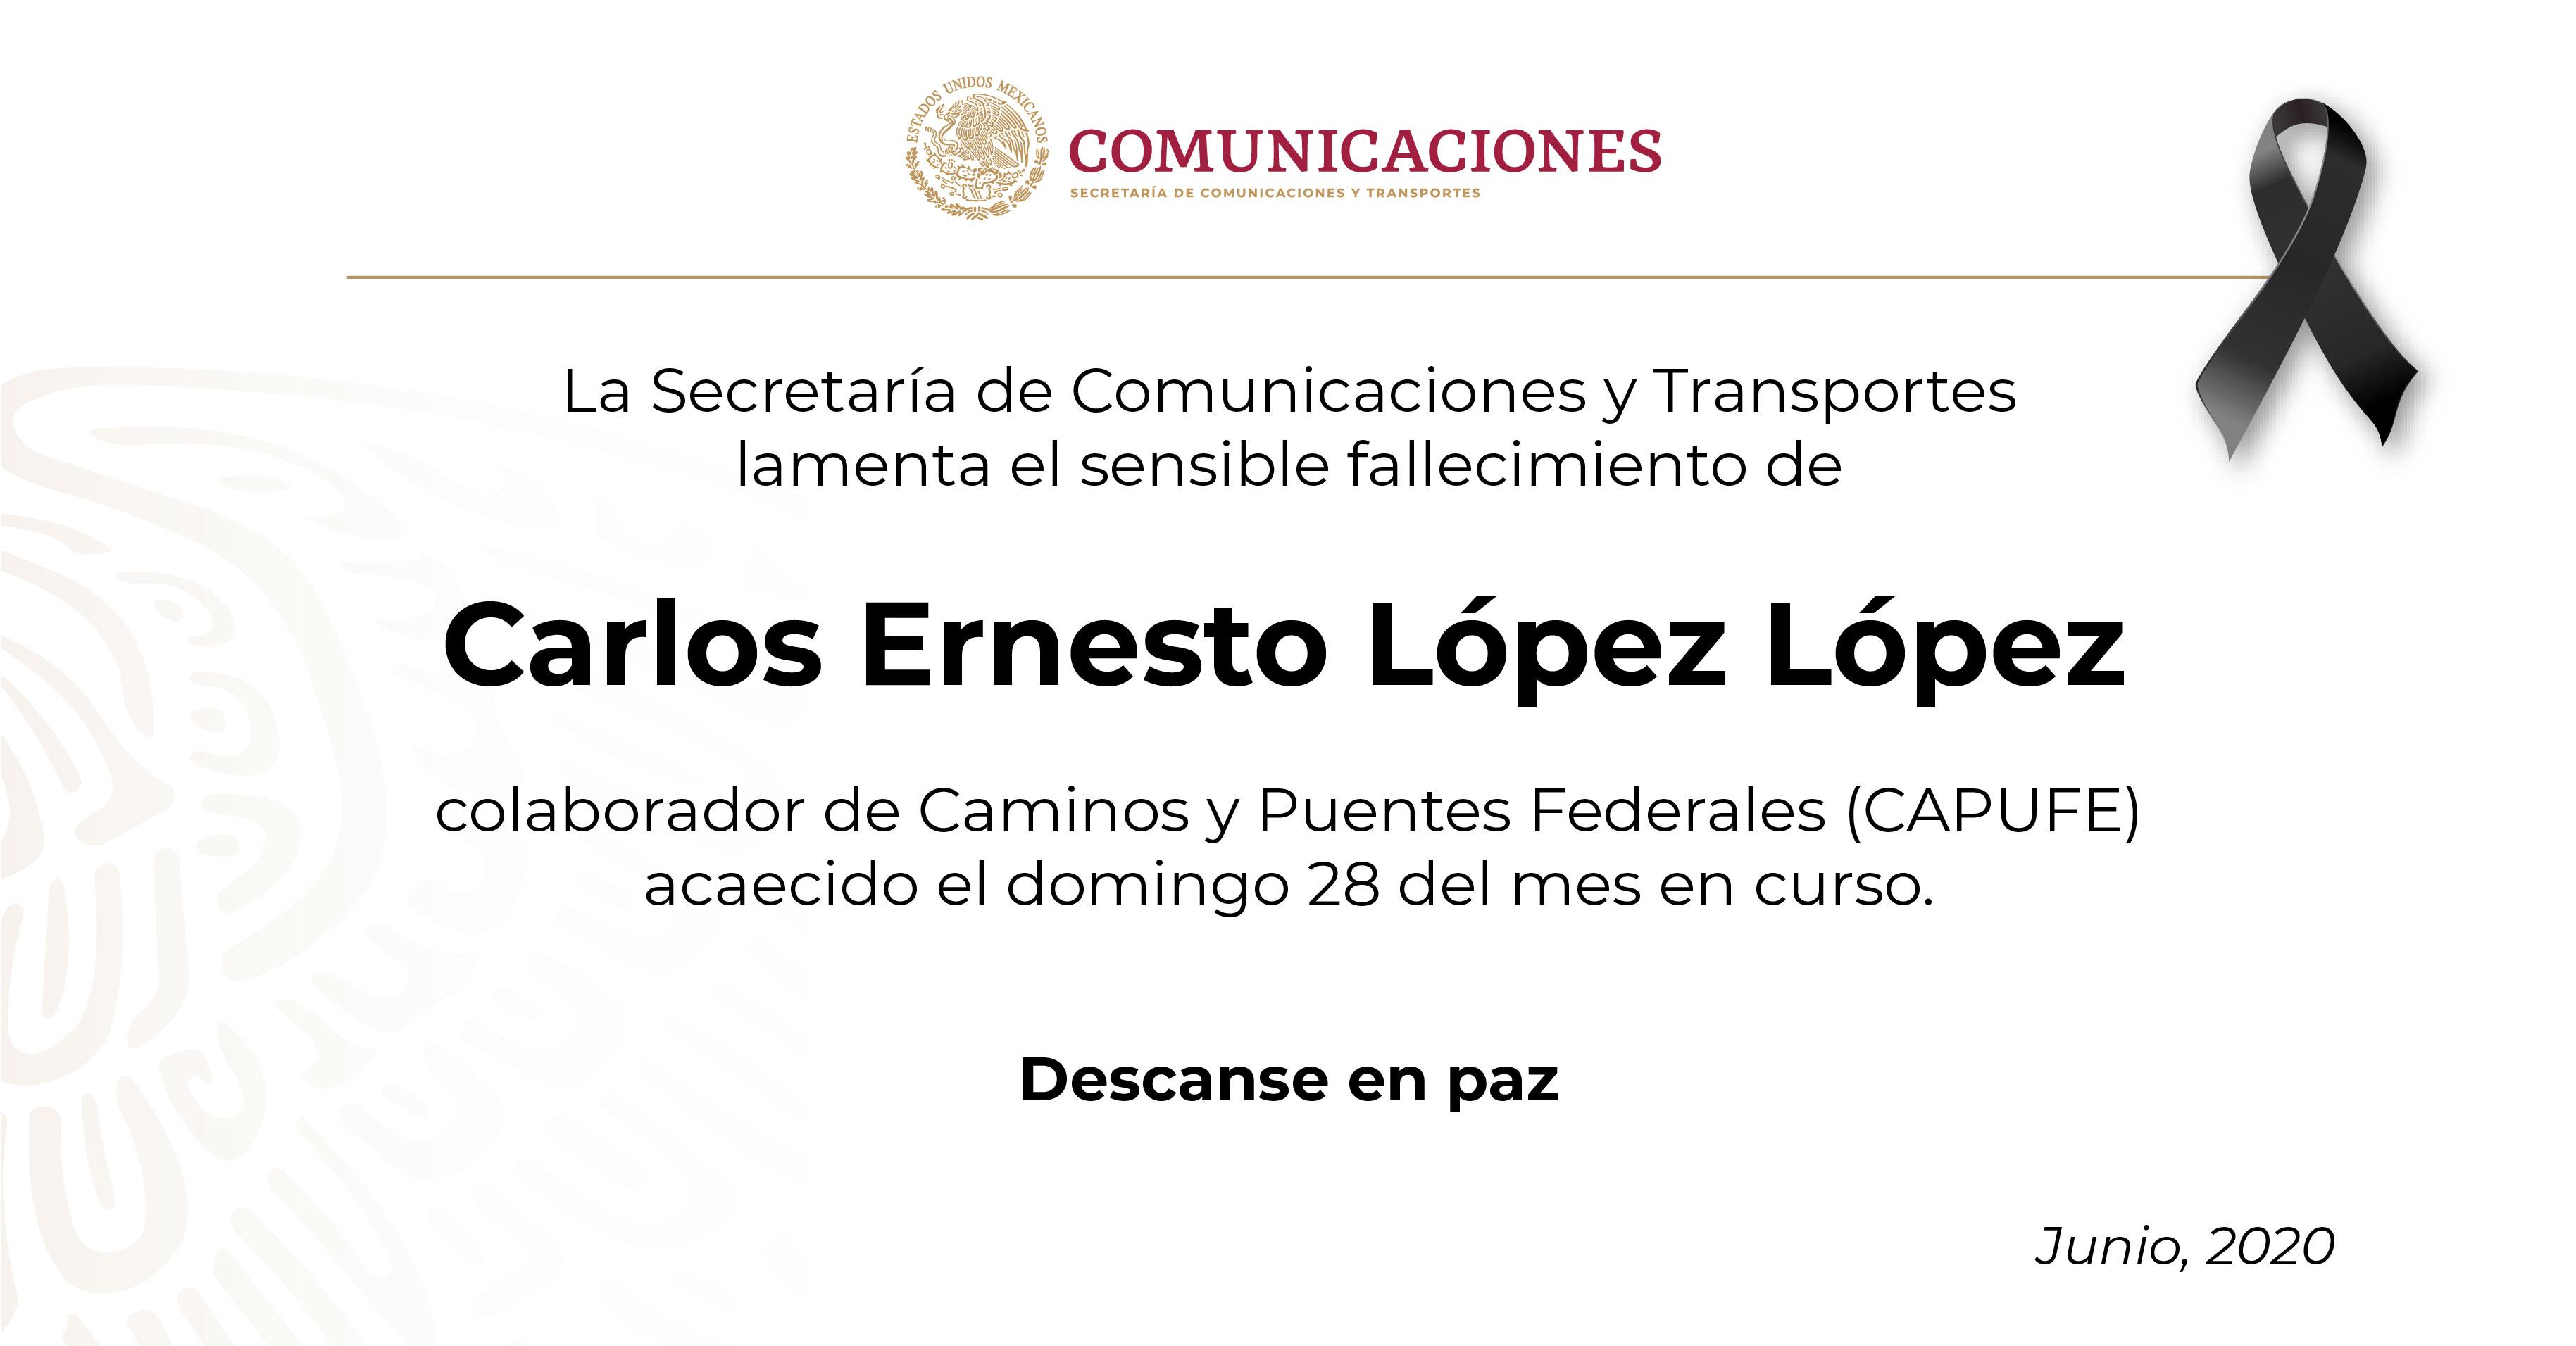 Carlos Ernesto López lópez